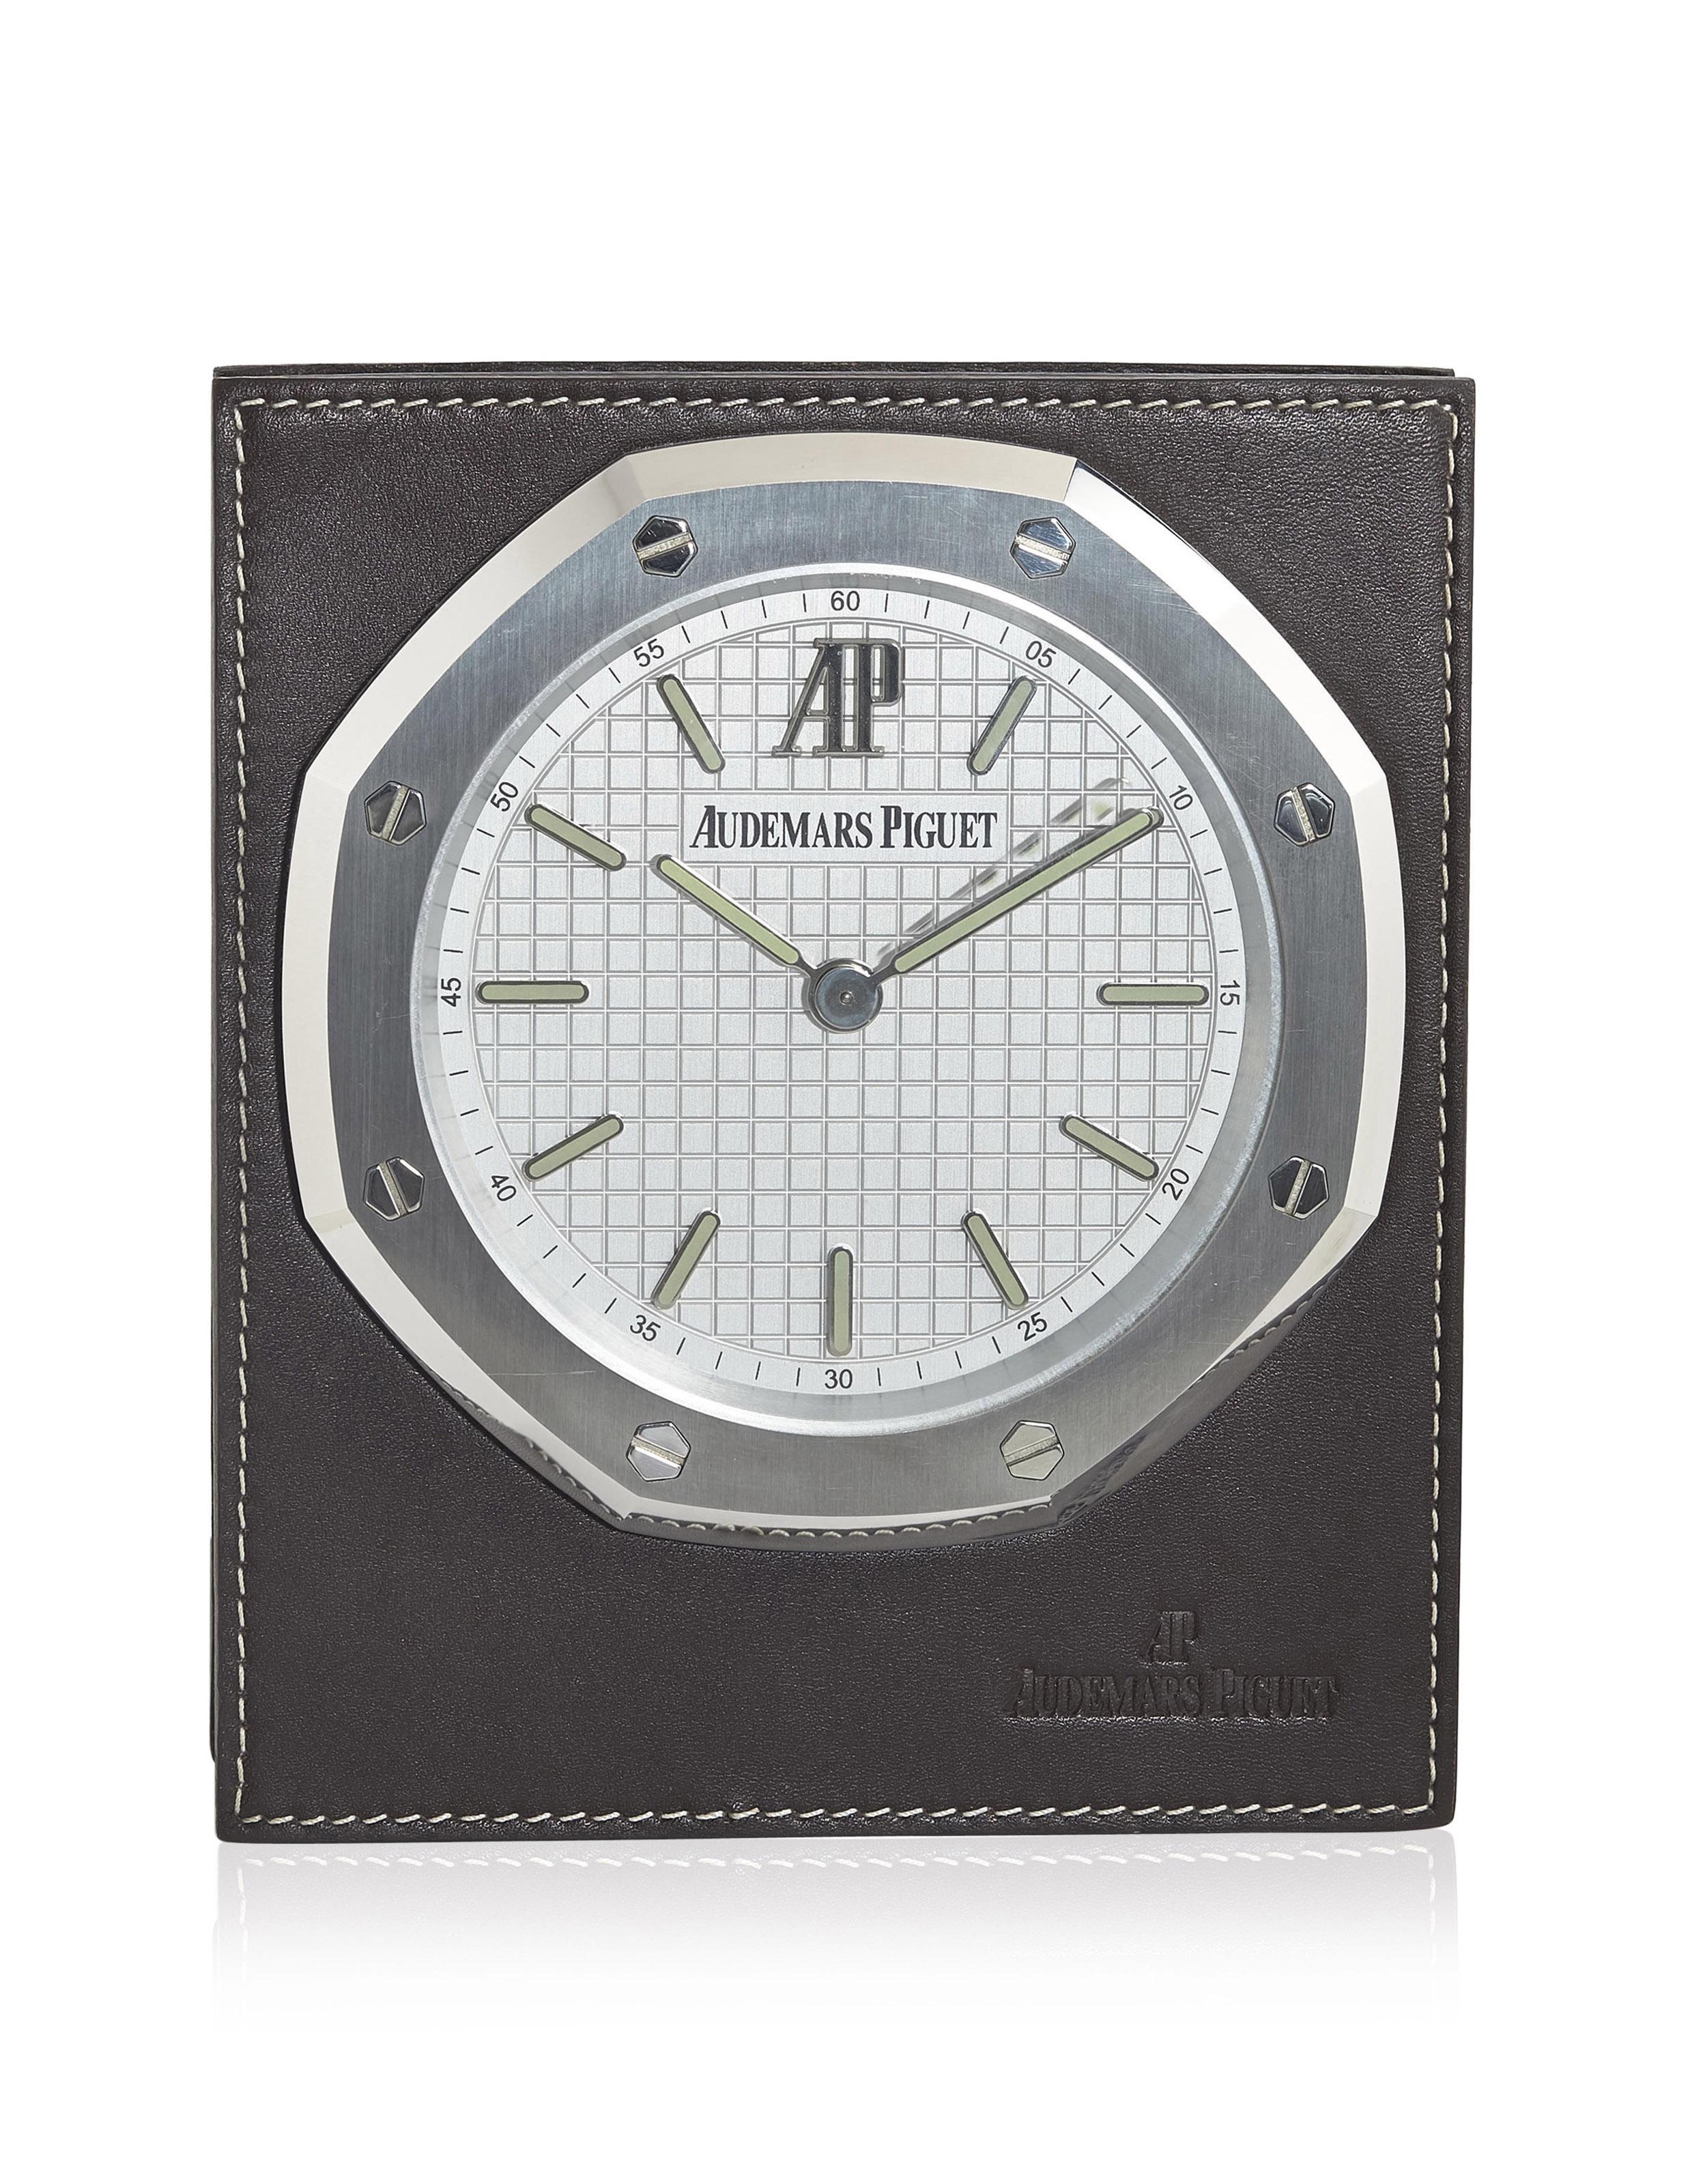 Audemars Piguet Stainless Steel Royal Oak Desk Clock With Leather